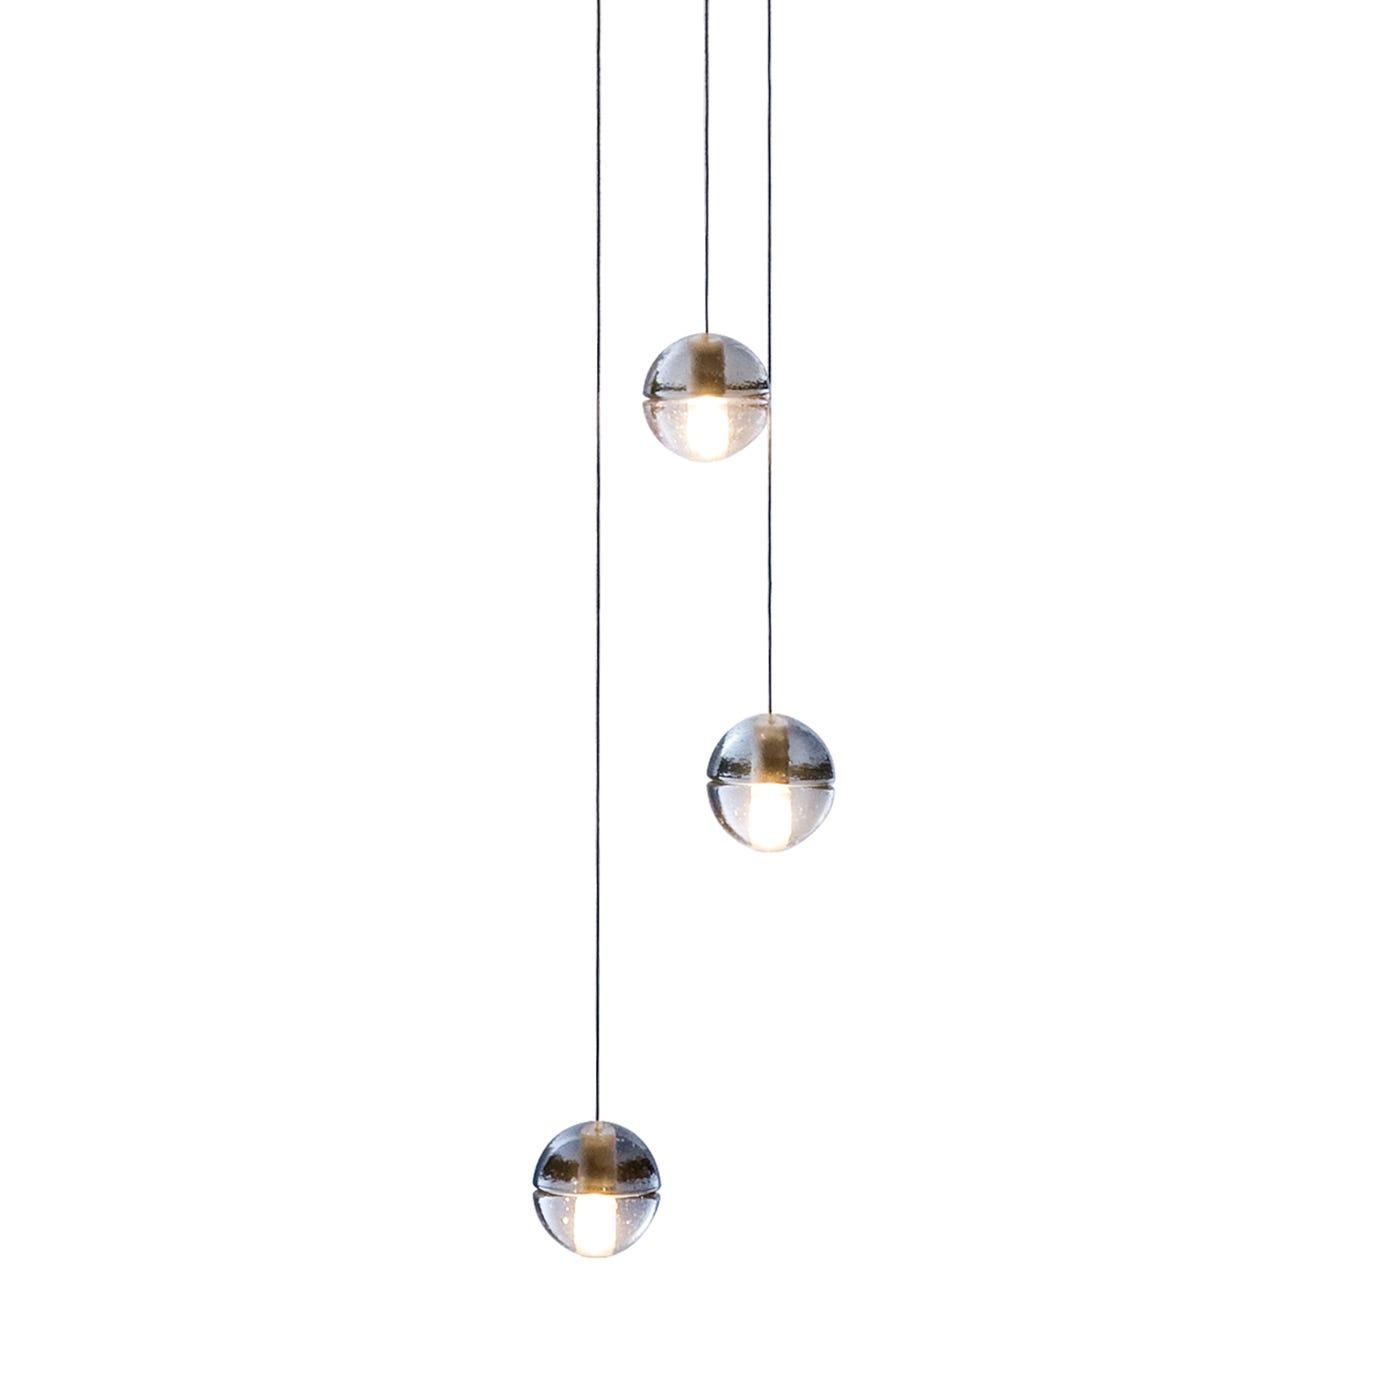 etsy lighting pendants. 14 Series Pendant Etsy Lighting Pendants